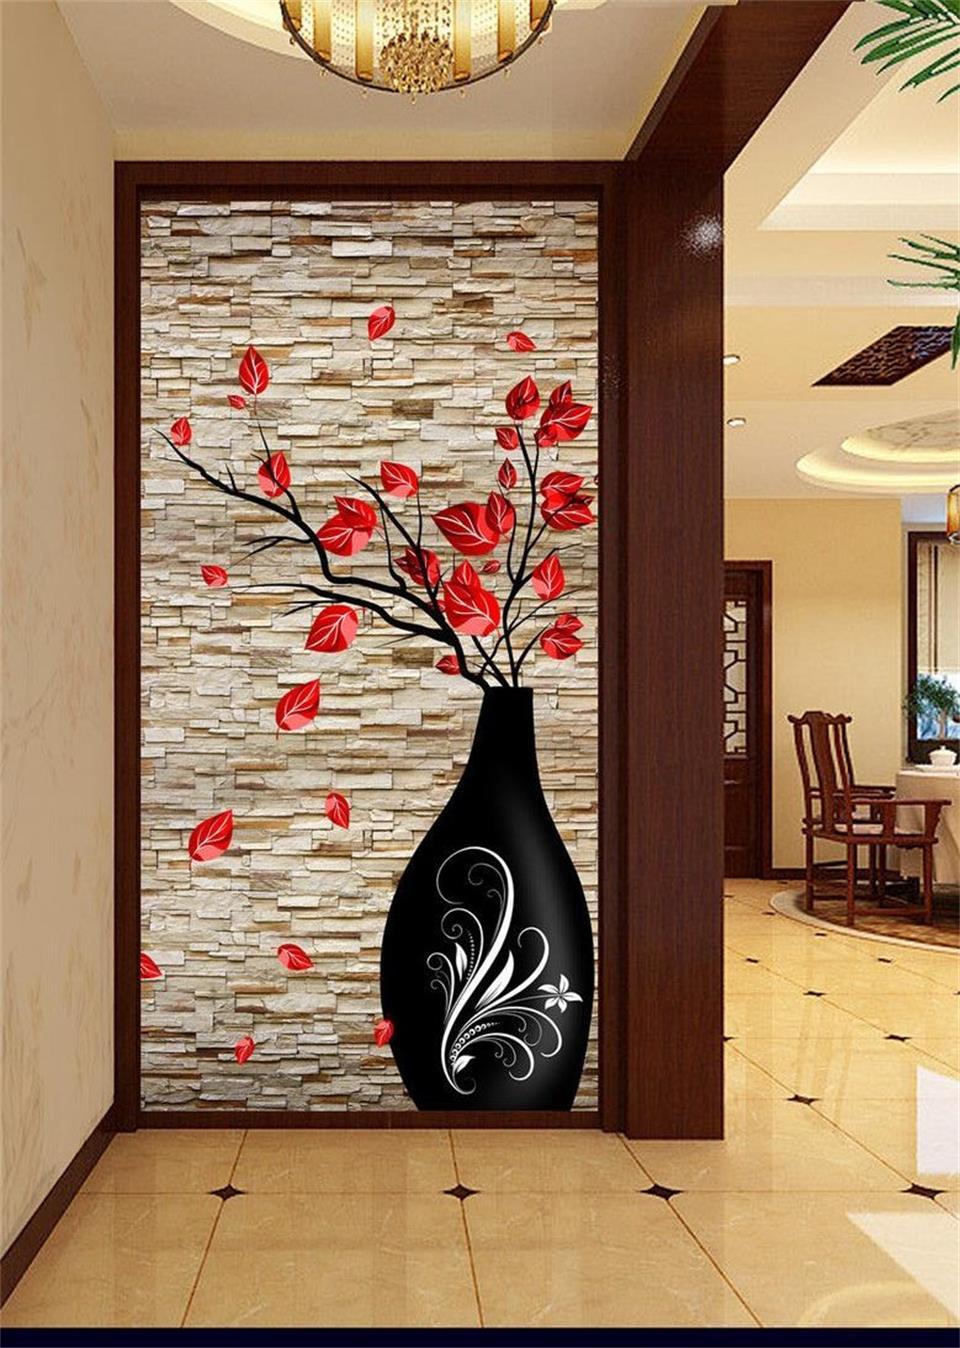 US $15.49 49% OFF|3d foto wallpaper benutzerdefinierten wandbild wohnzimmer  veranda vasen ziegel wand blume 3d malerei bild wandbilder wallpaper für ...